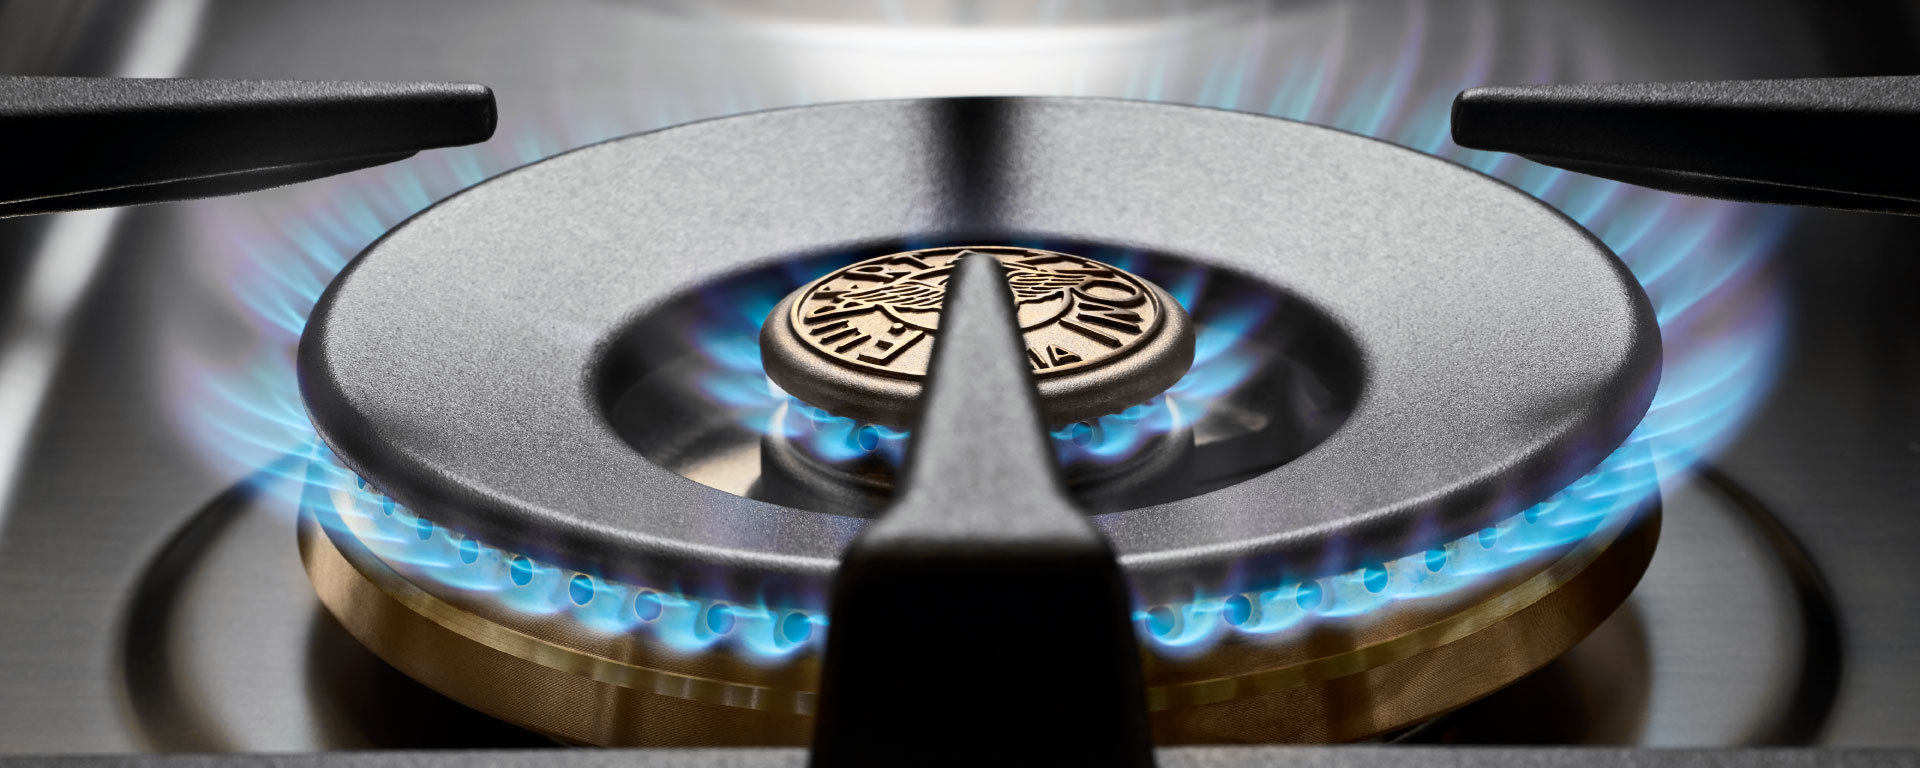 Газовая плита Bertazzoni MAS1006MFEDXT